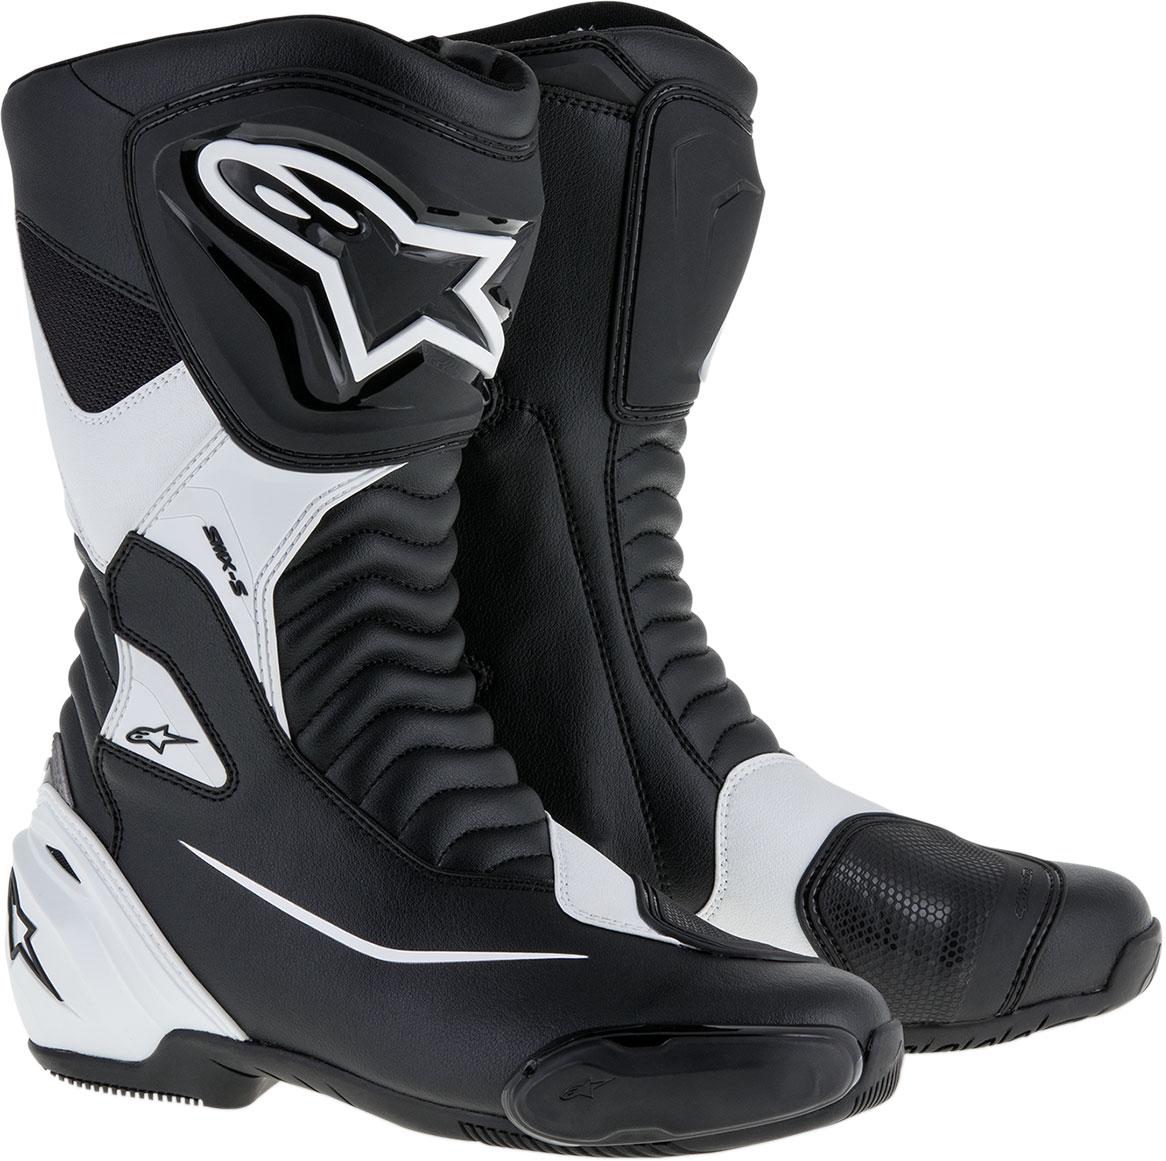 Alpinestars SMX-S Leather Boots (Black/White)